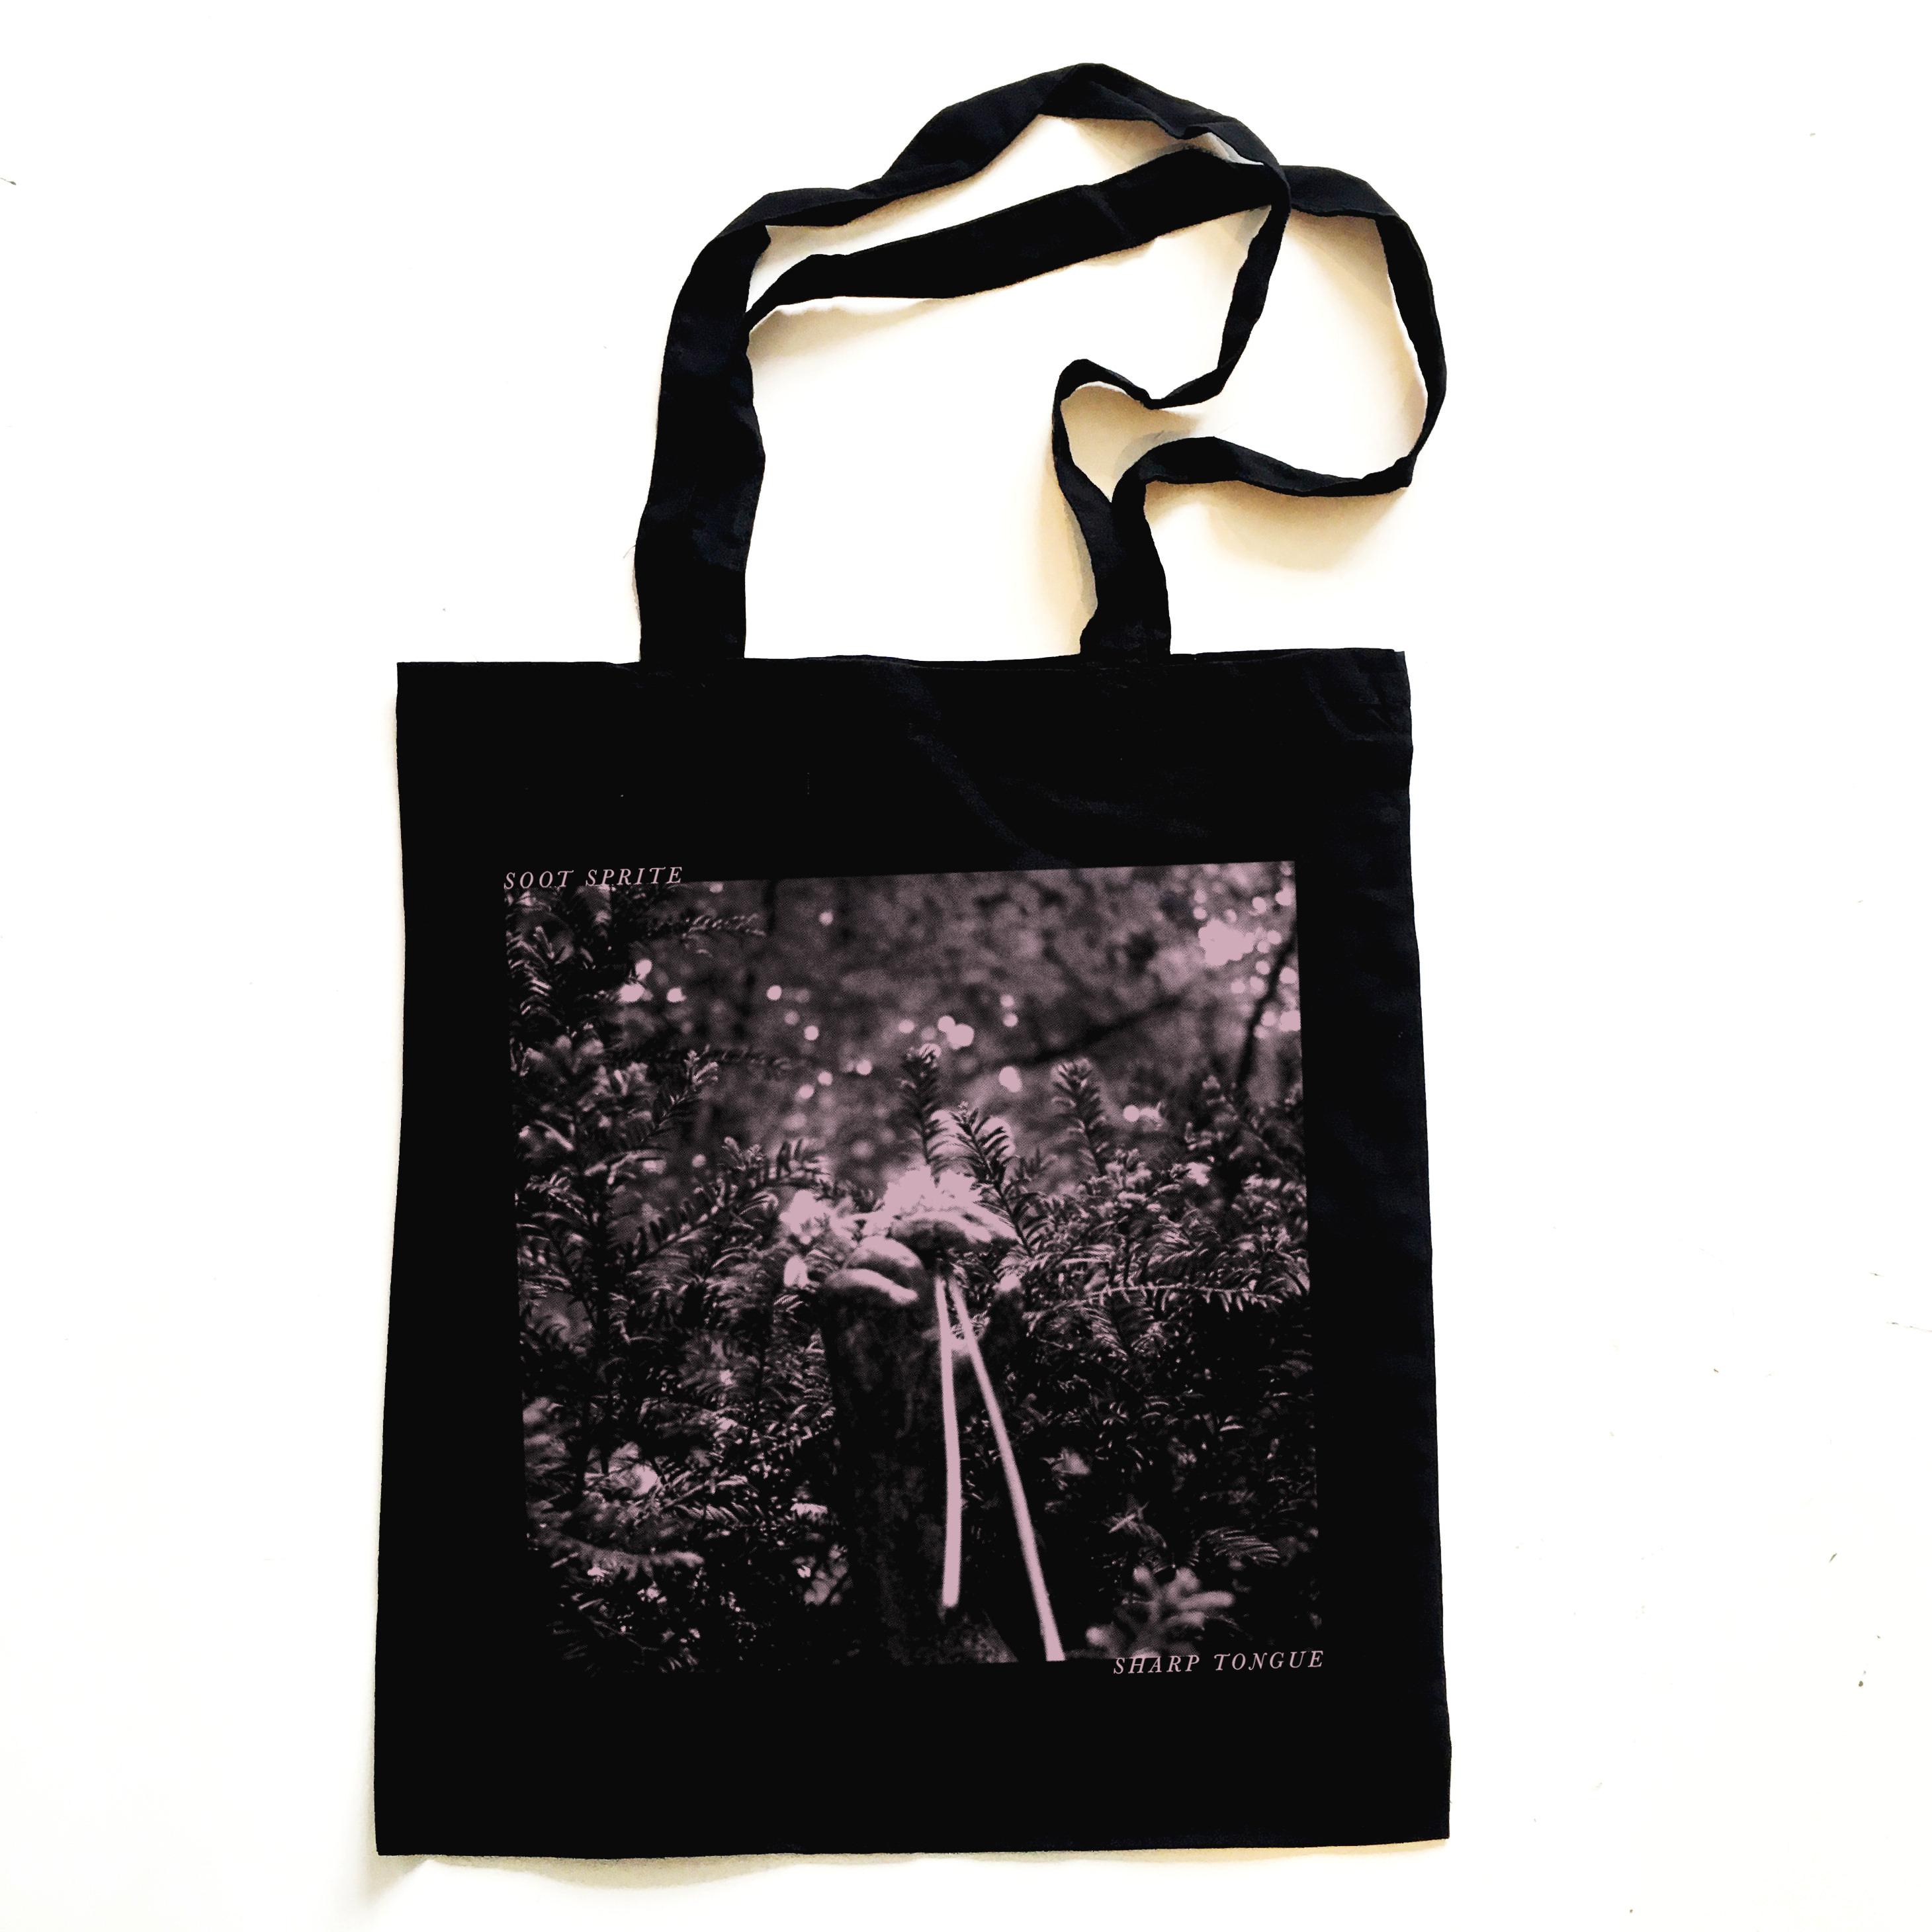 Soot Sprite - 'Sharp Tongue' Tote Bag